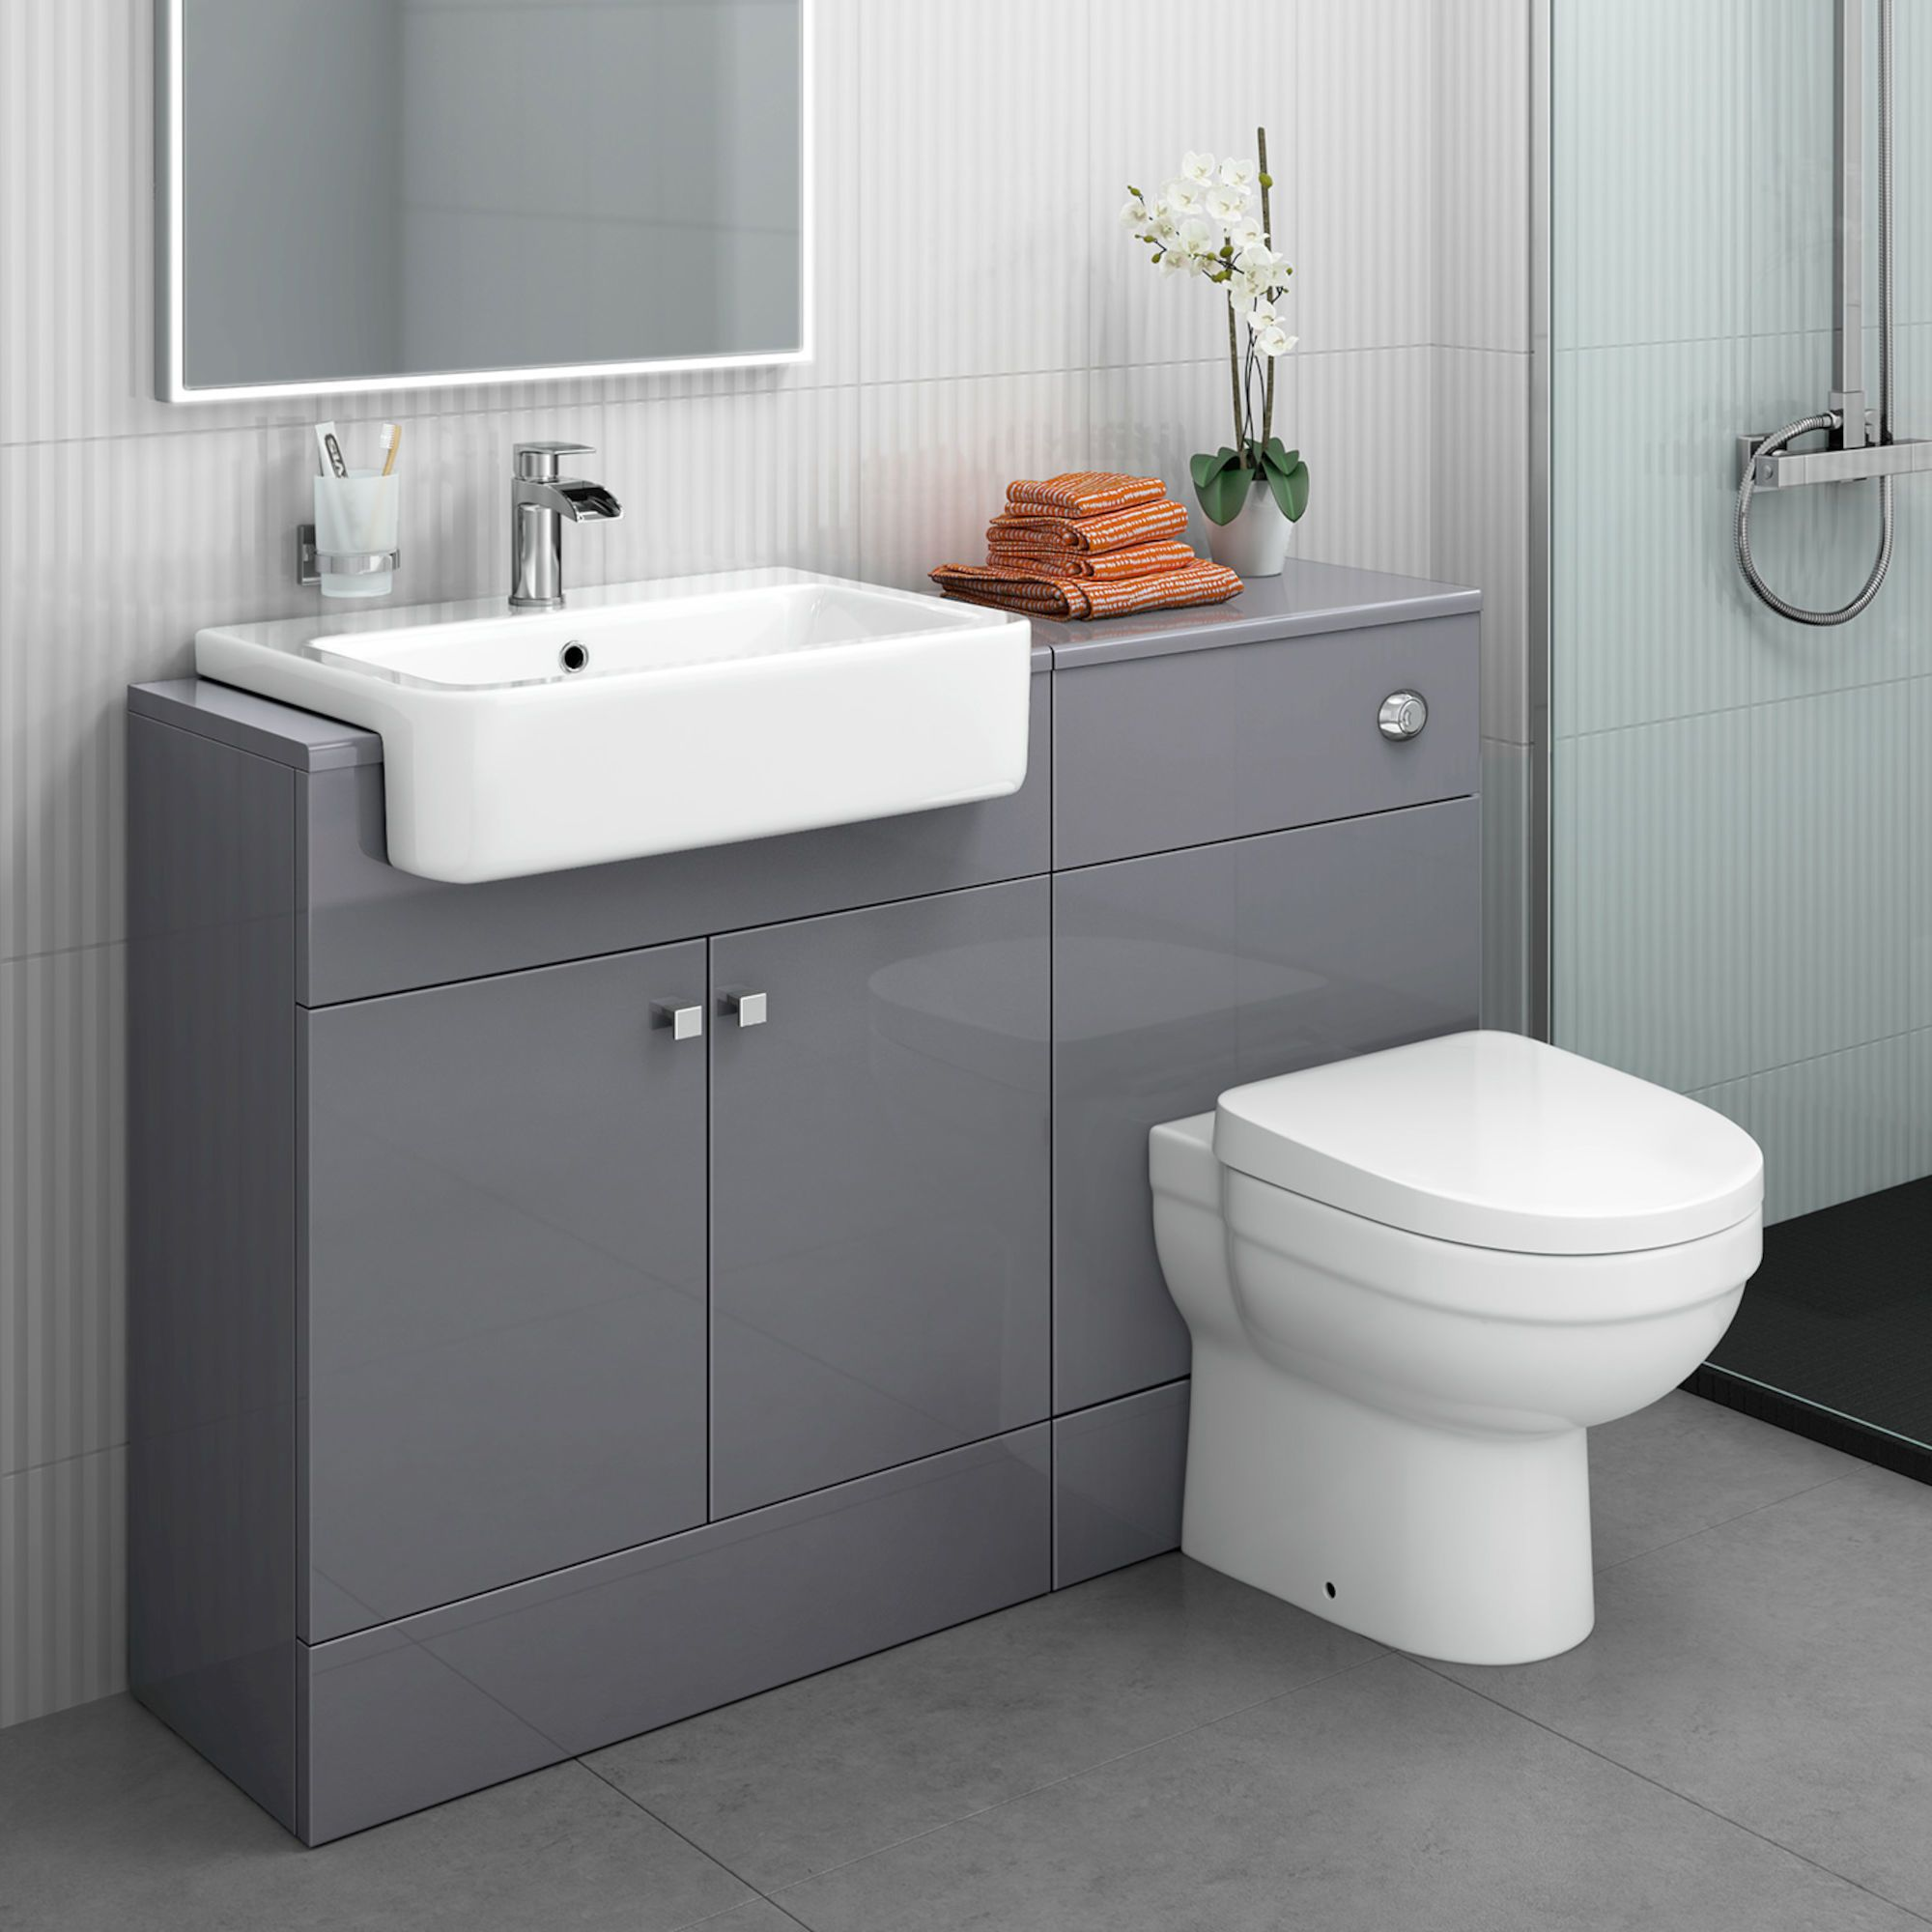 Efficient Bathroom Vanity Units Darbylanefurniture Com In 2020